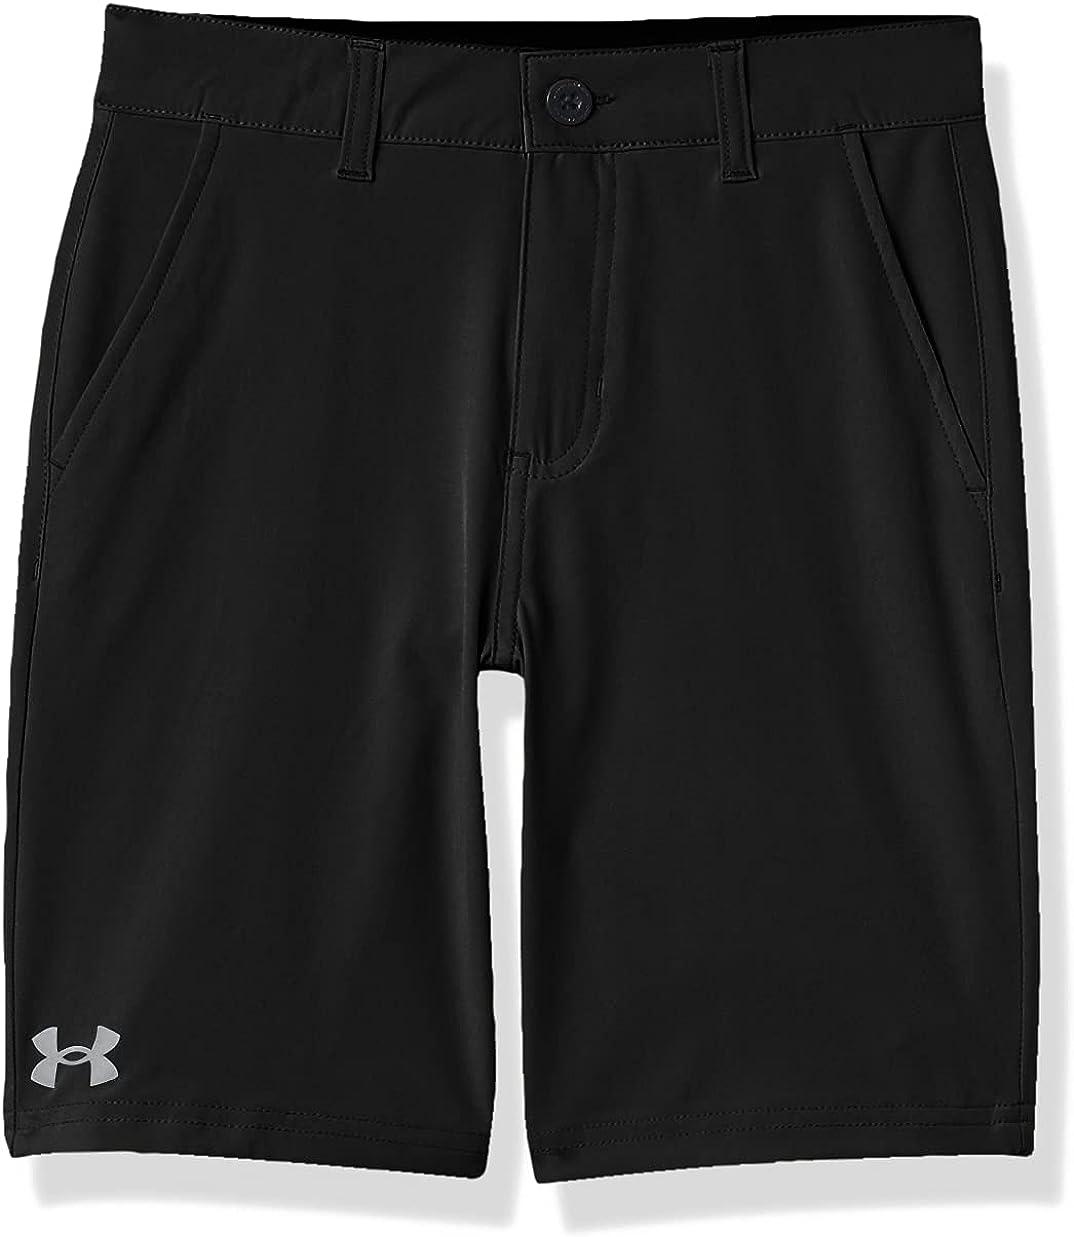 Under Armour Boys' Board Shorts